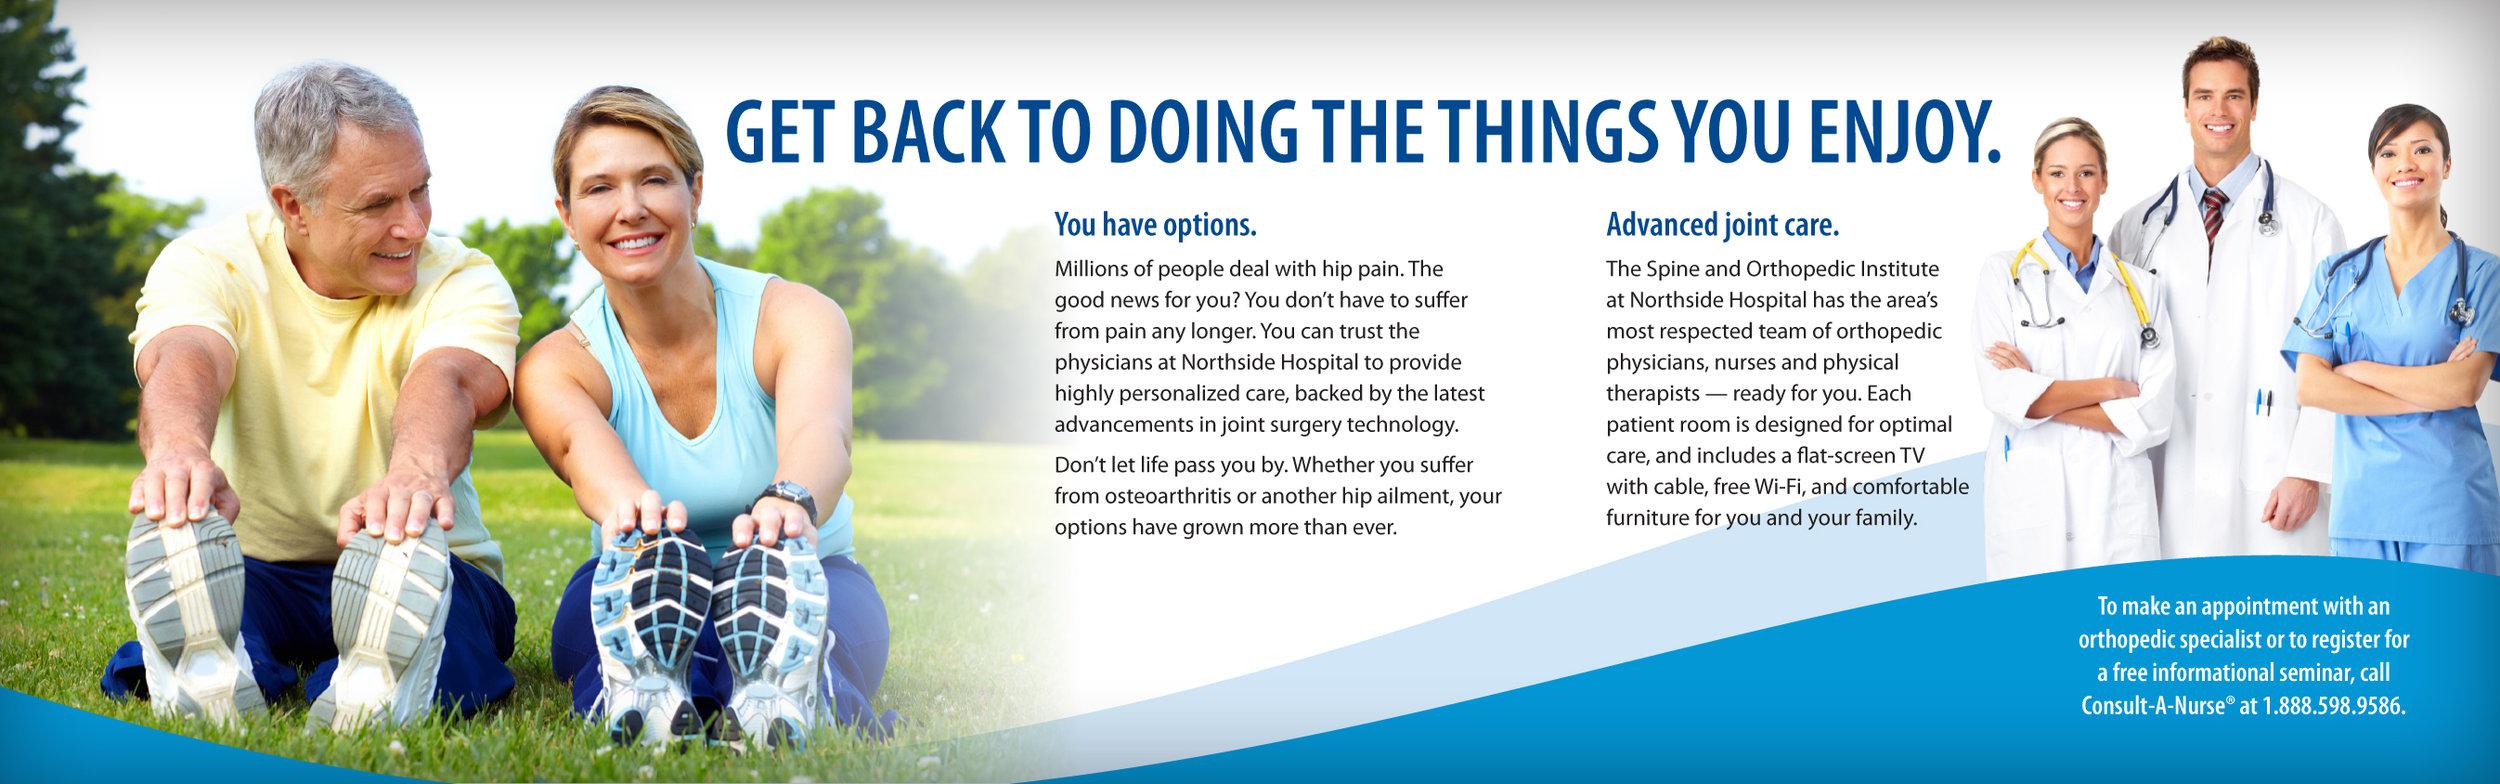 Orthopedic Mailer2.jpg